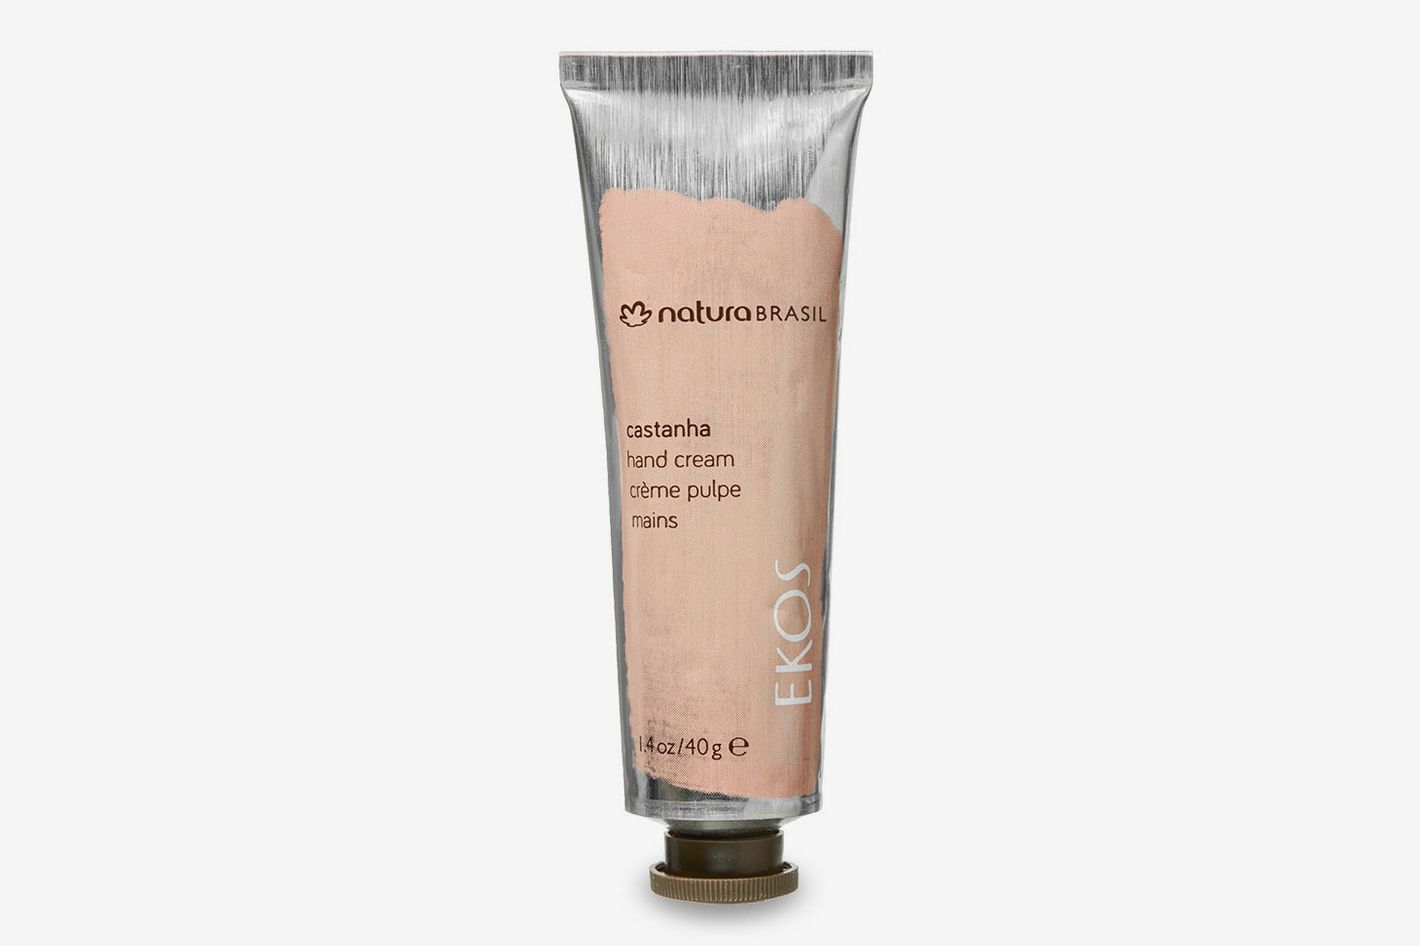 Naturabrasil Castanha Hand Cream